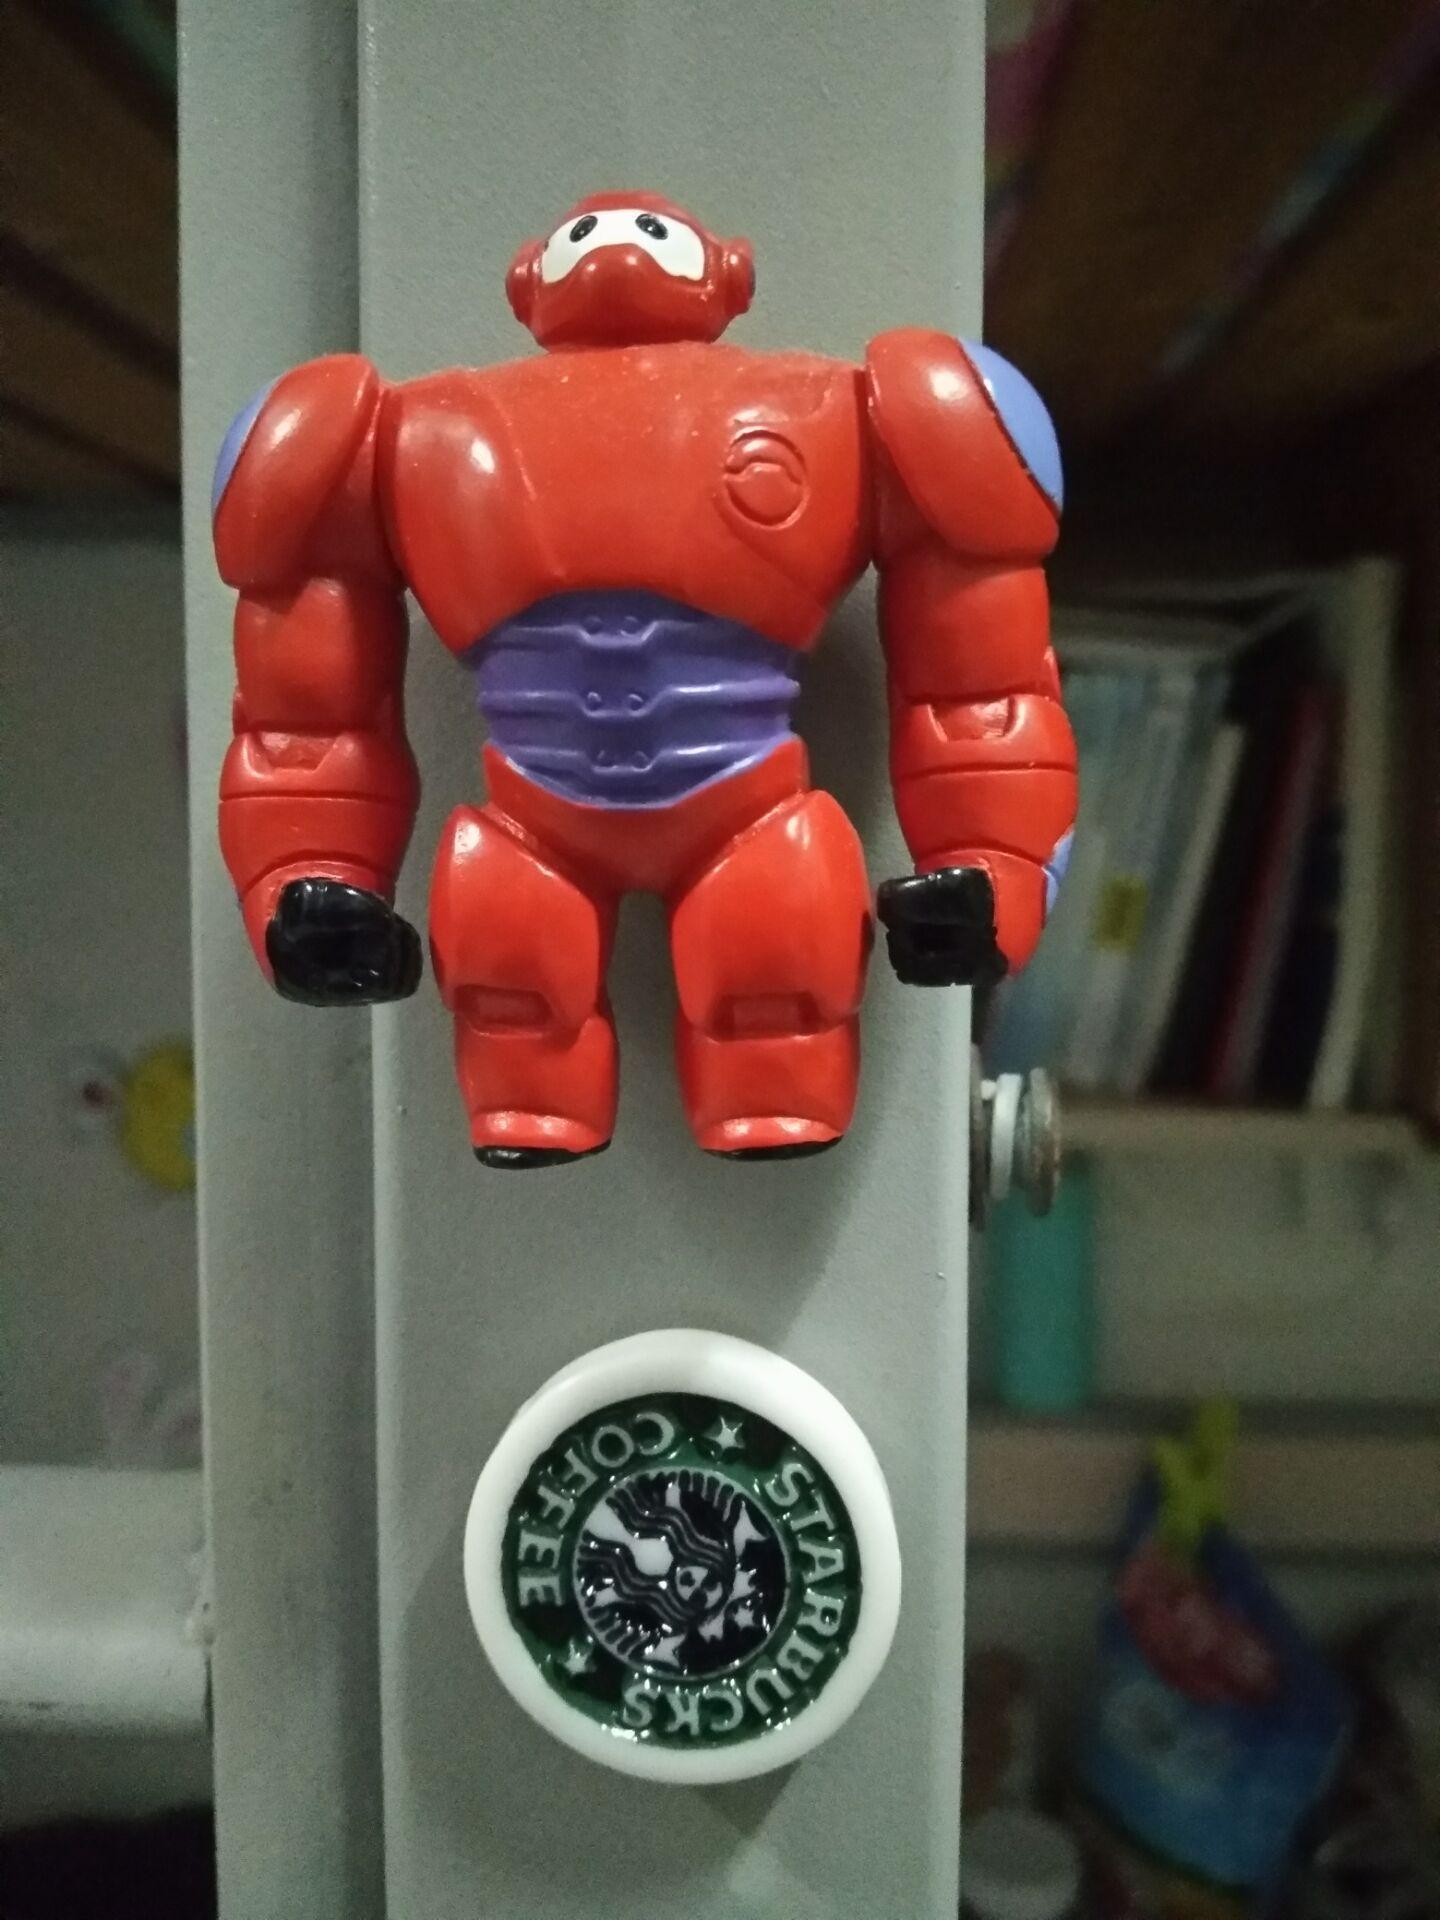 armor baymax ornament refrigerator magnet cute cortoon message